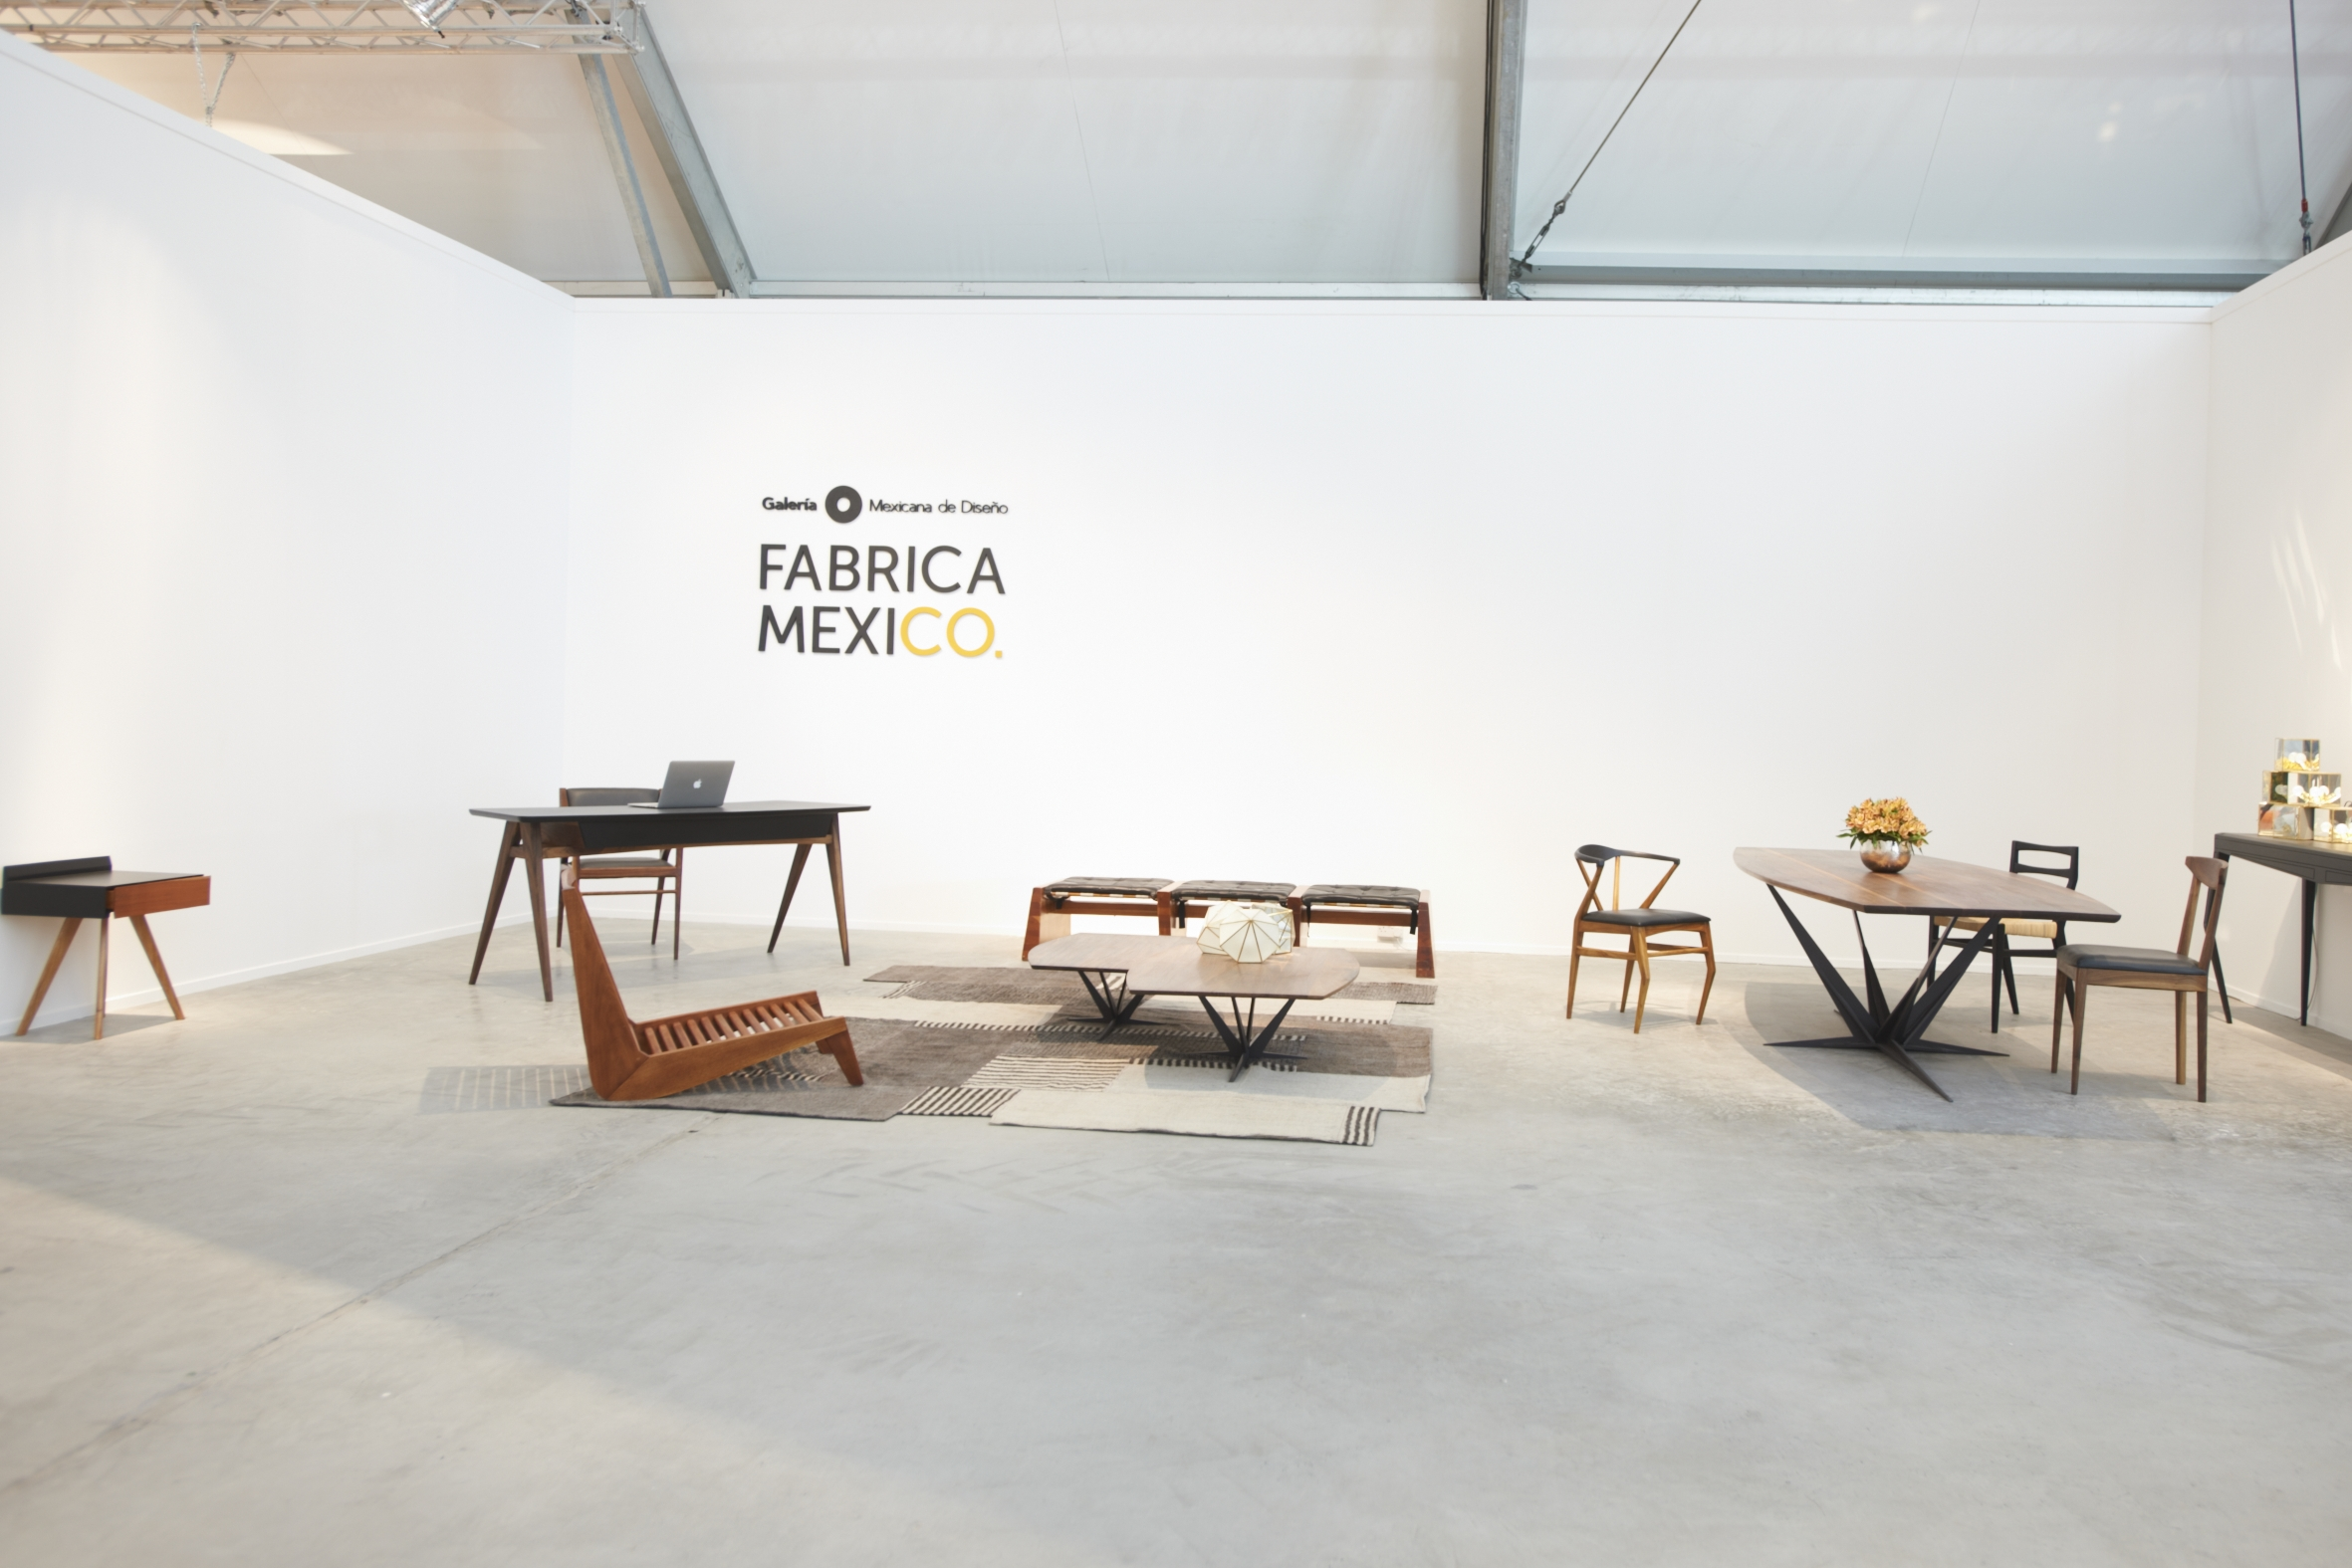 Galeria Mexicana de Diseno